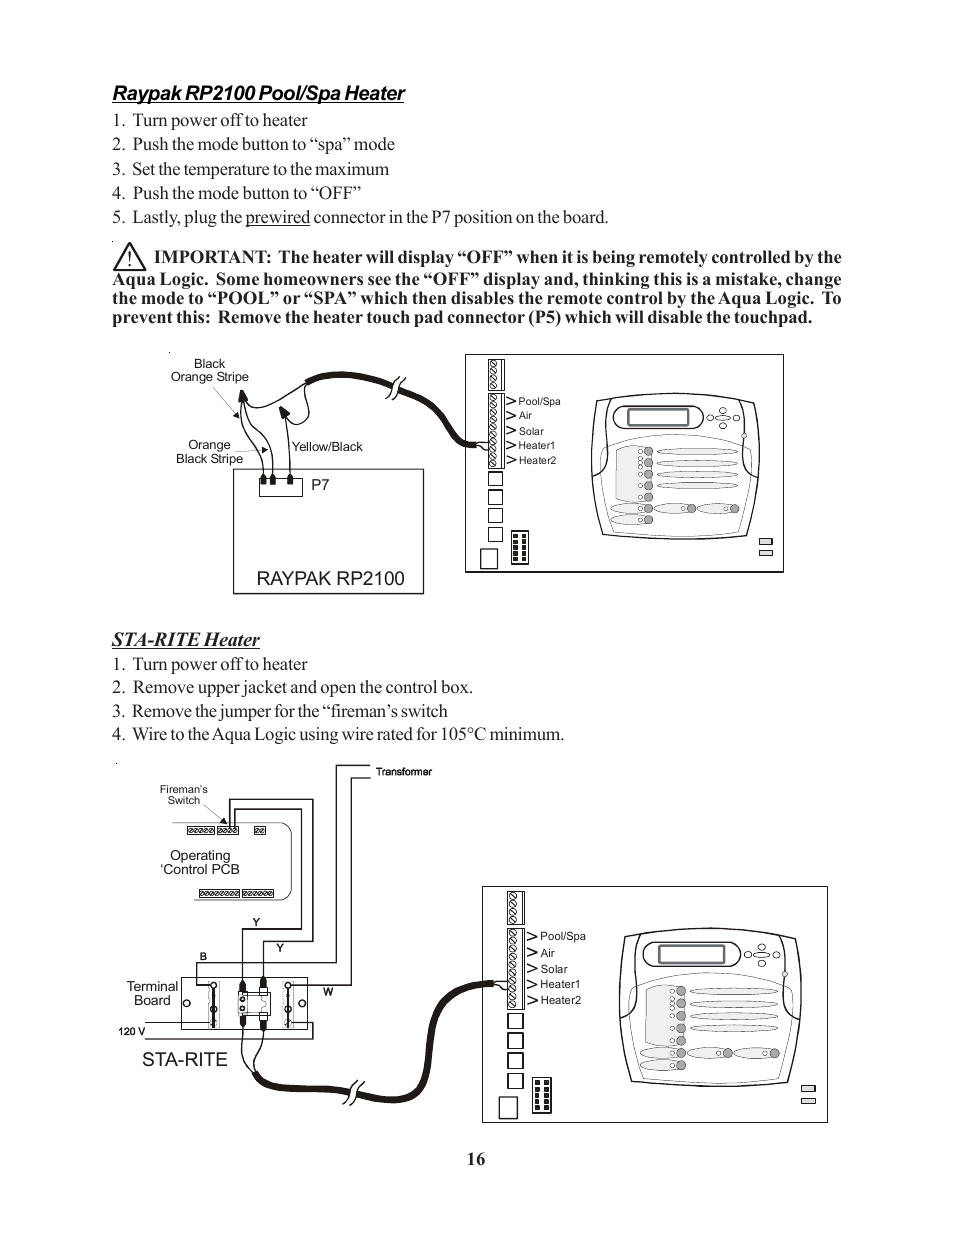 Raypak rp2100 pool/spa heater, Sta-rite heater, Raypak rp2100 | Raypak PS-4  PS-8 User Manual | Page 19 / 32